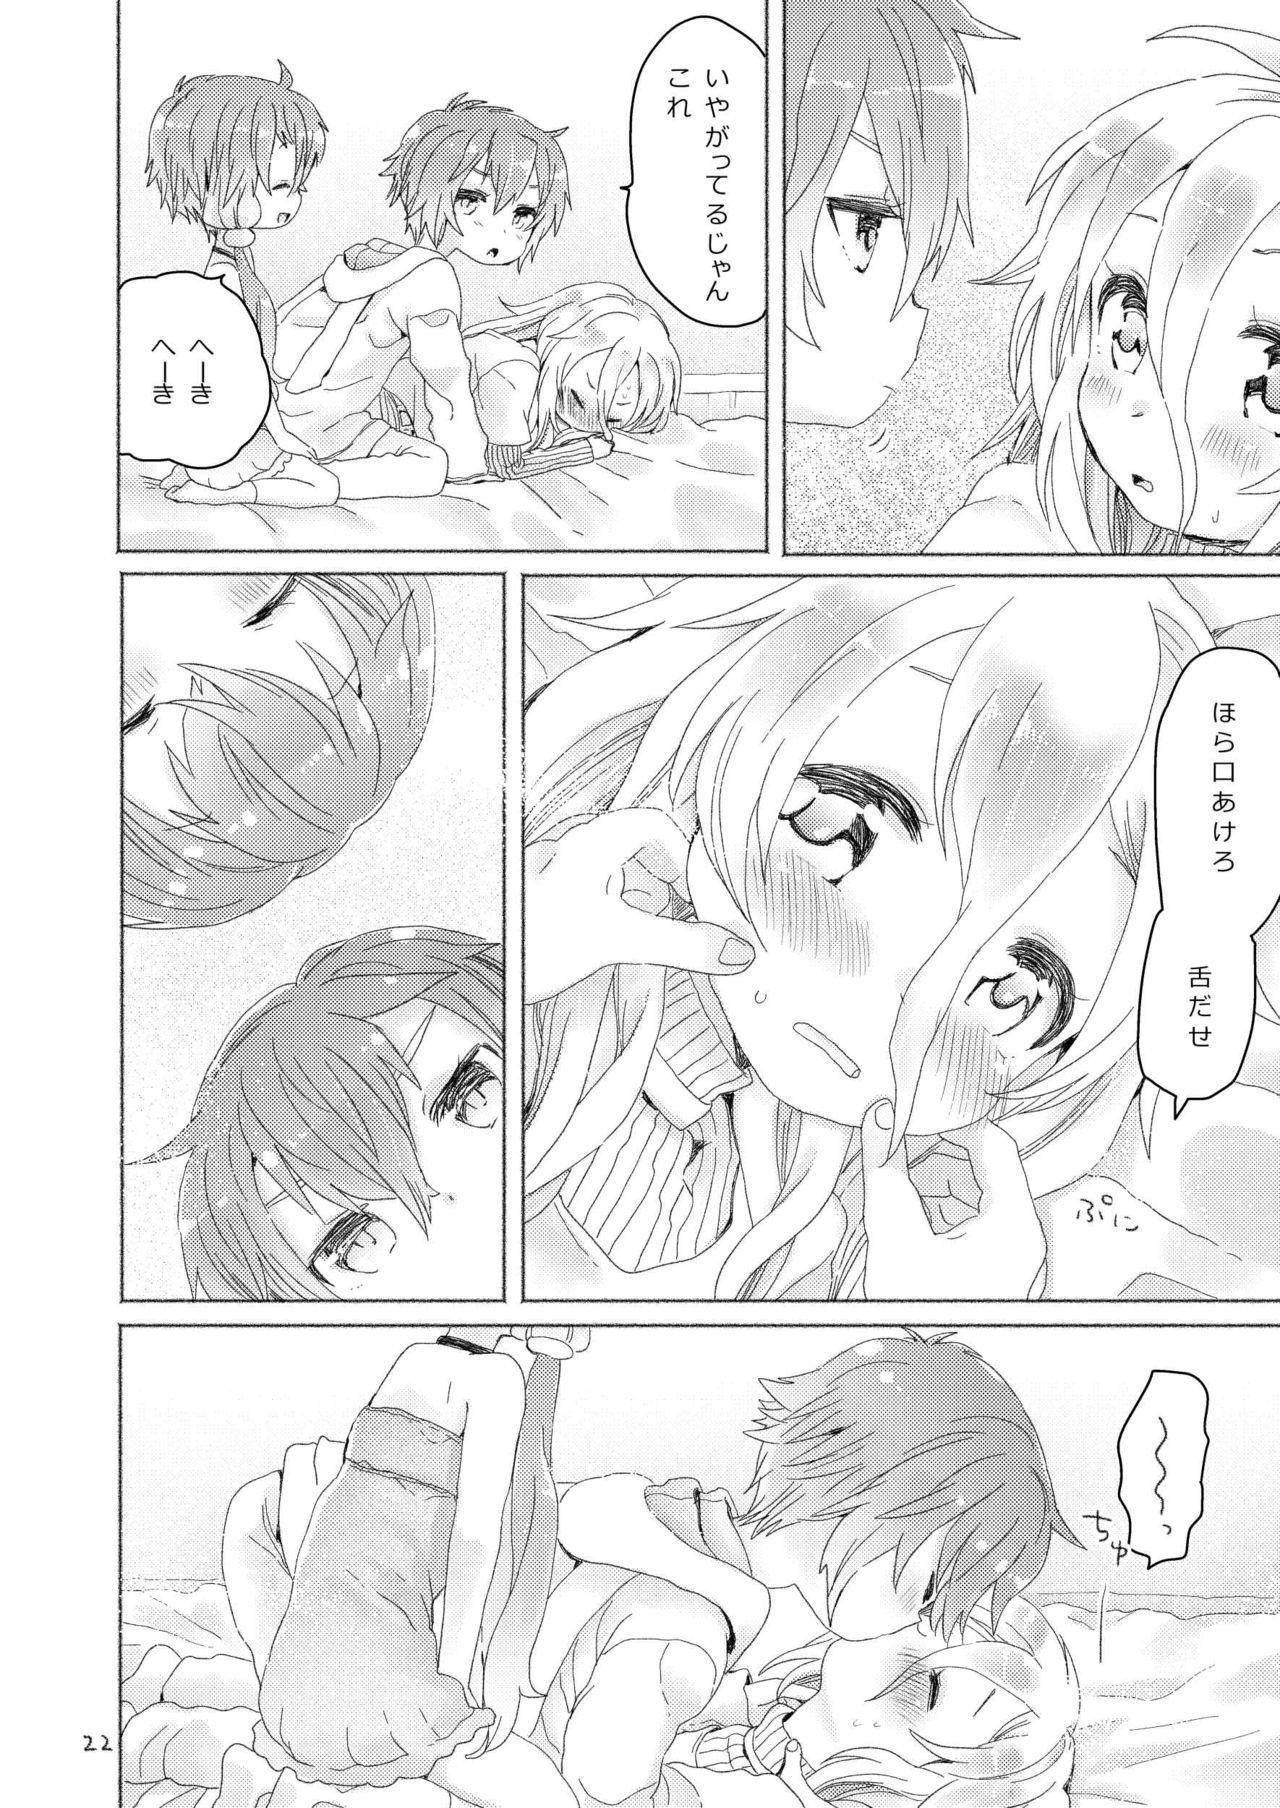 Yuzuki IA 3